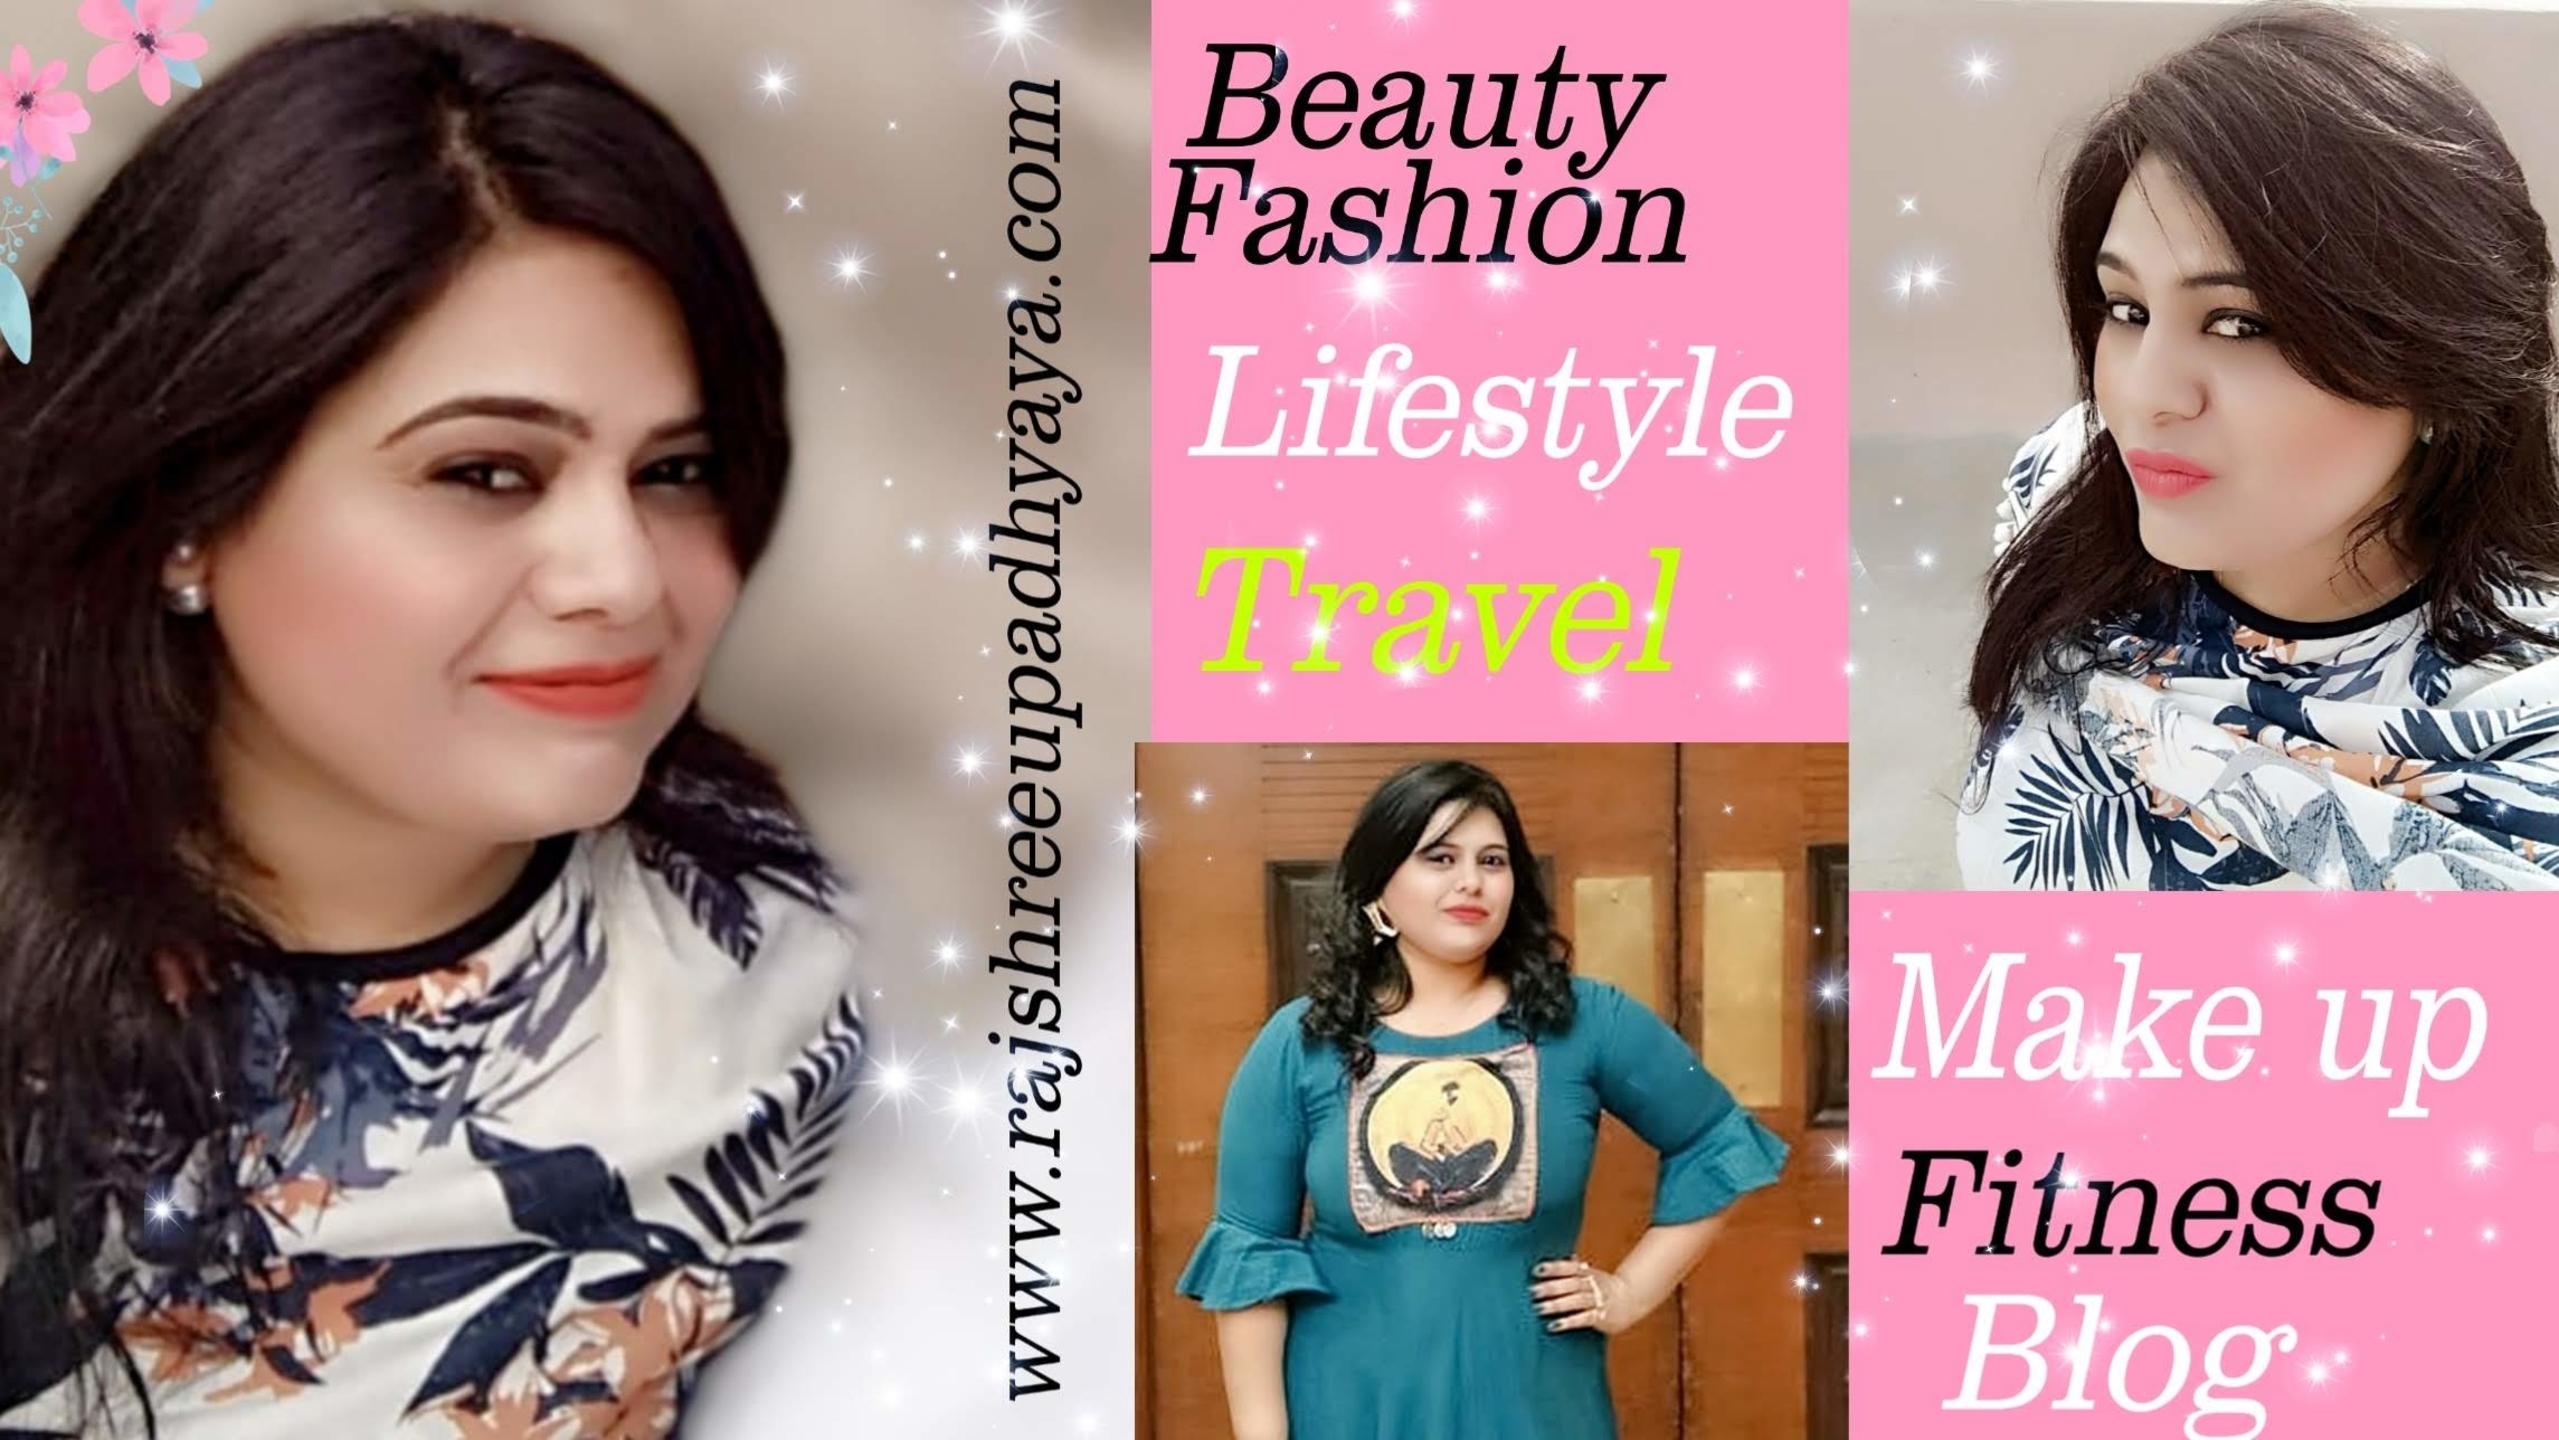 Rajshree Upadhyaya - A Day In Bloggers Life